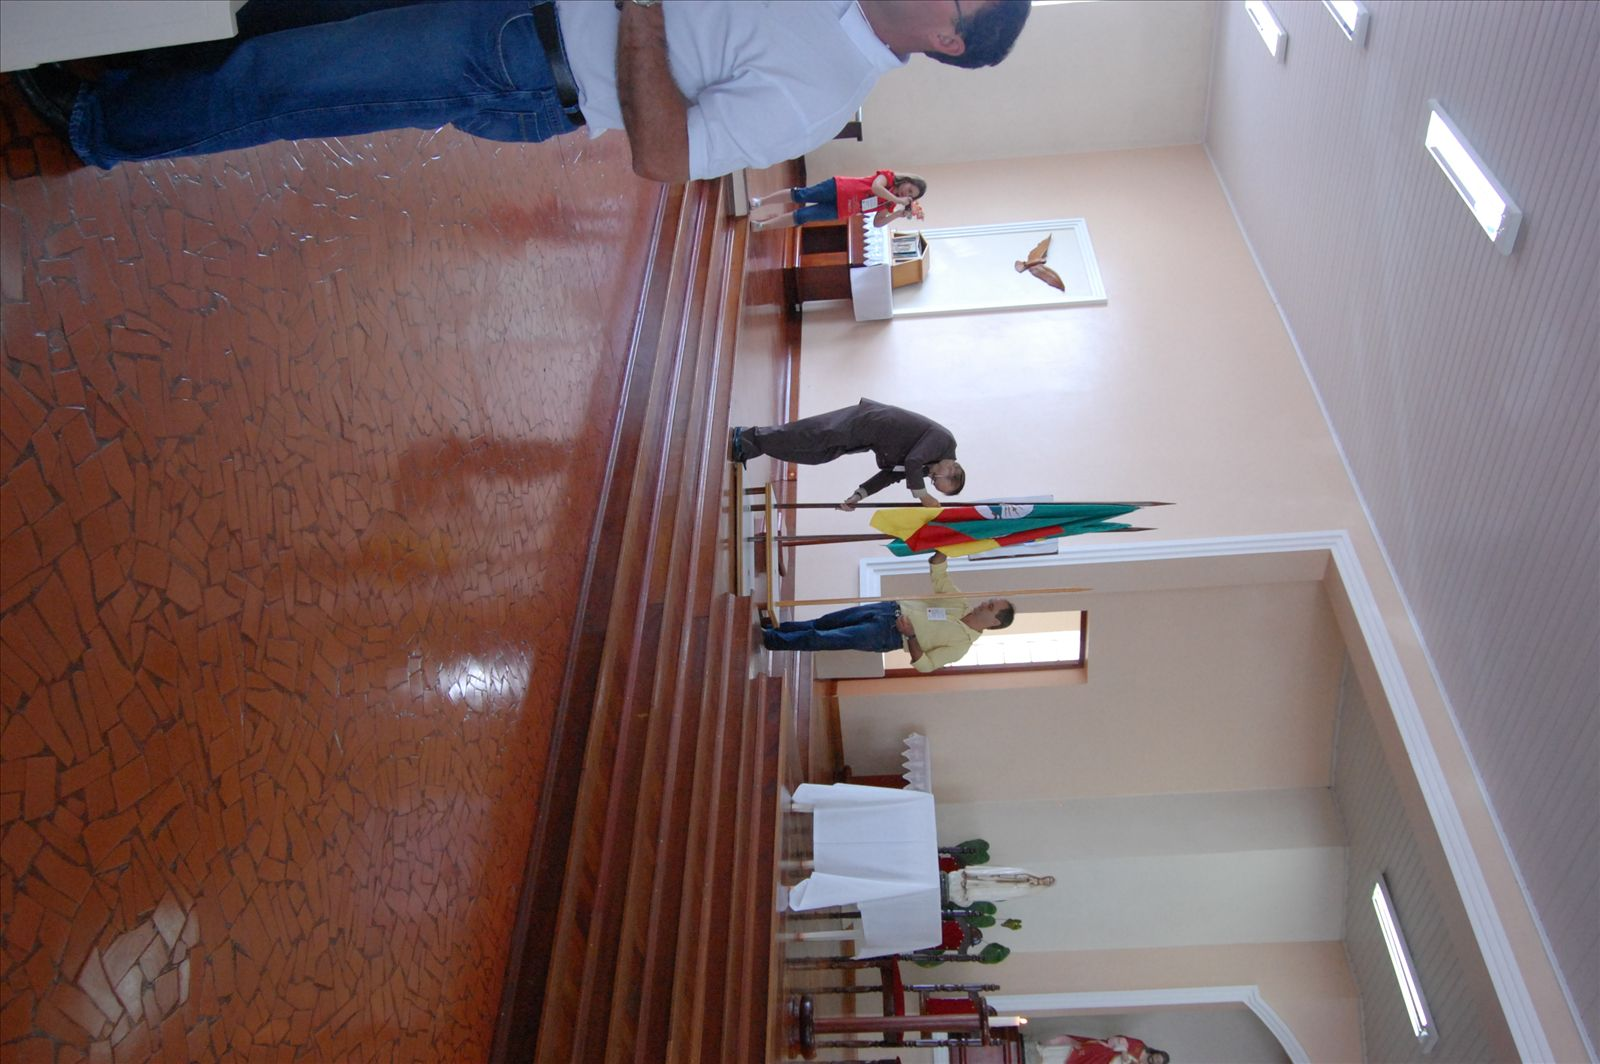 2º Encontro Família Cornelli - 11.10.2009 (111)_0